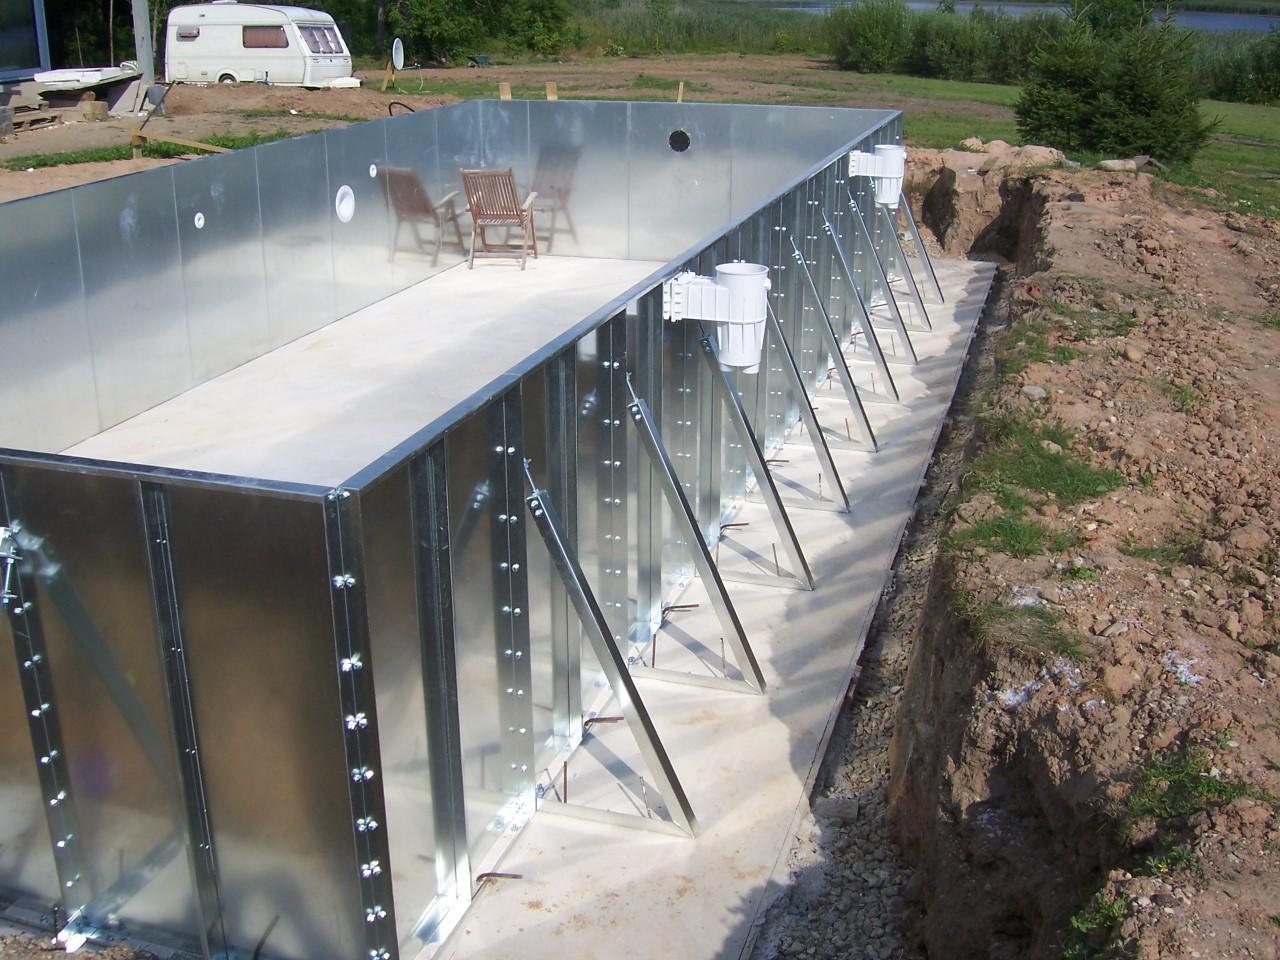 Bazeni Metalni Panel